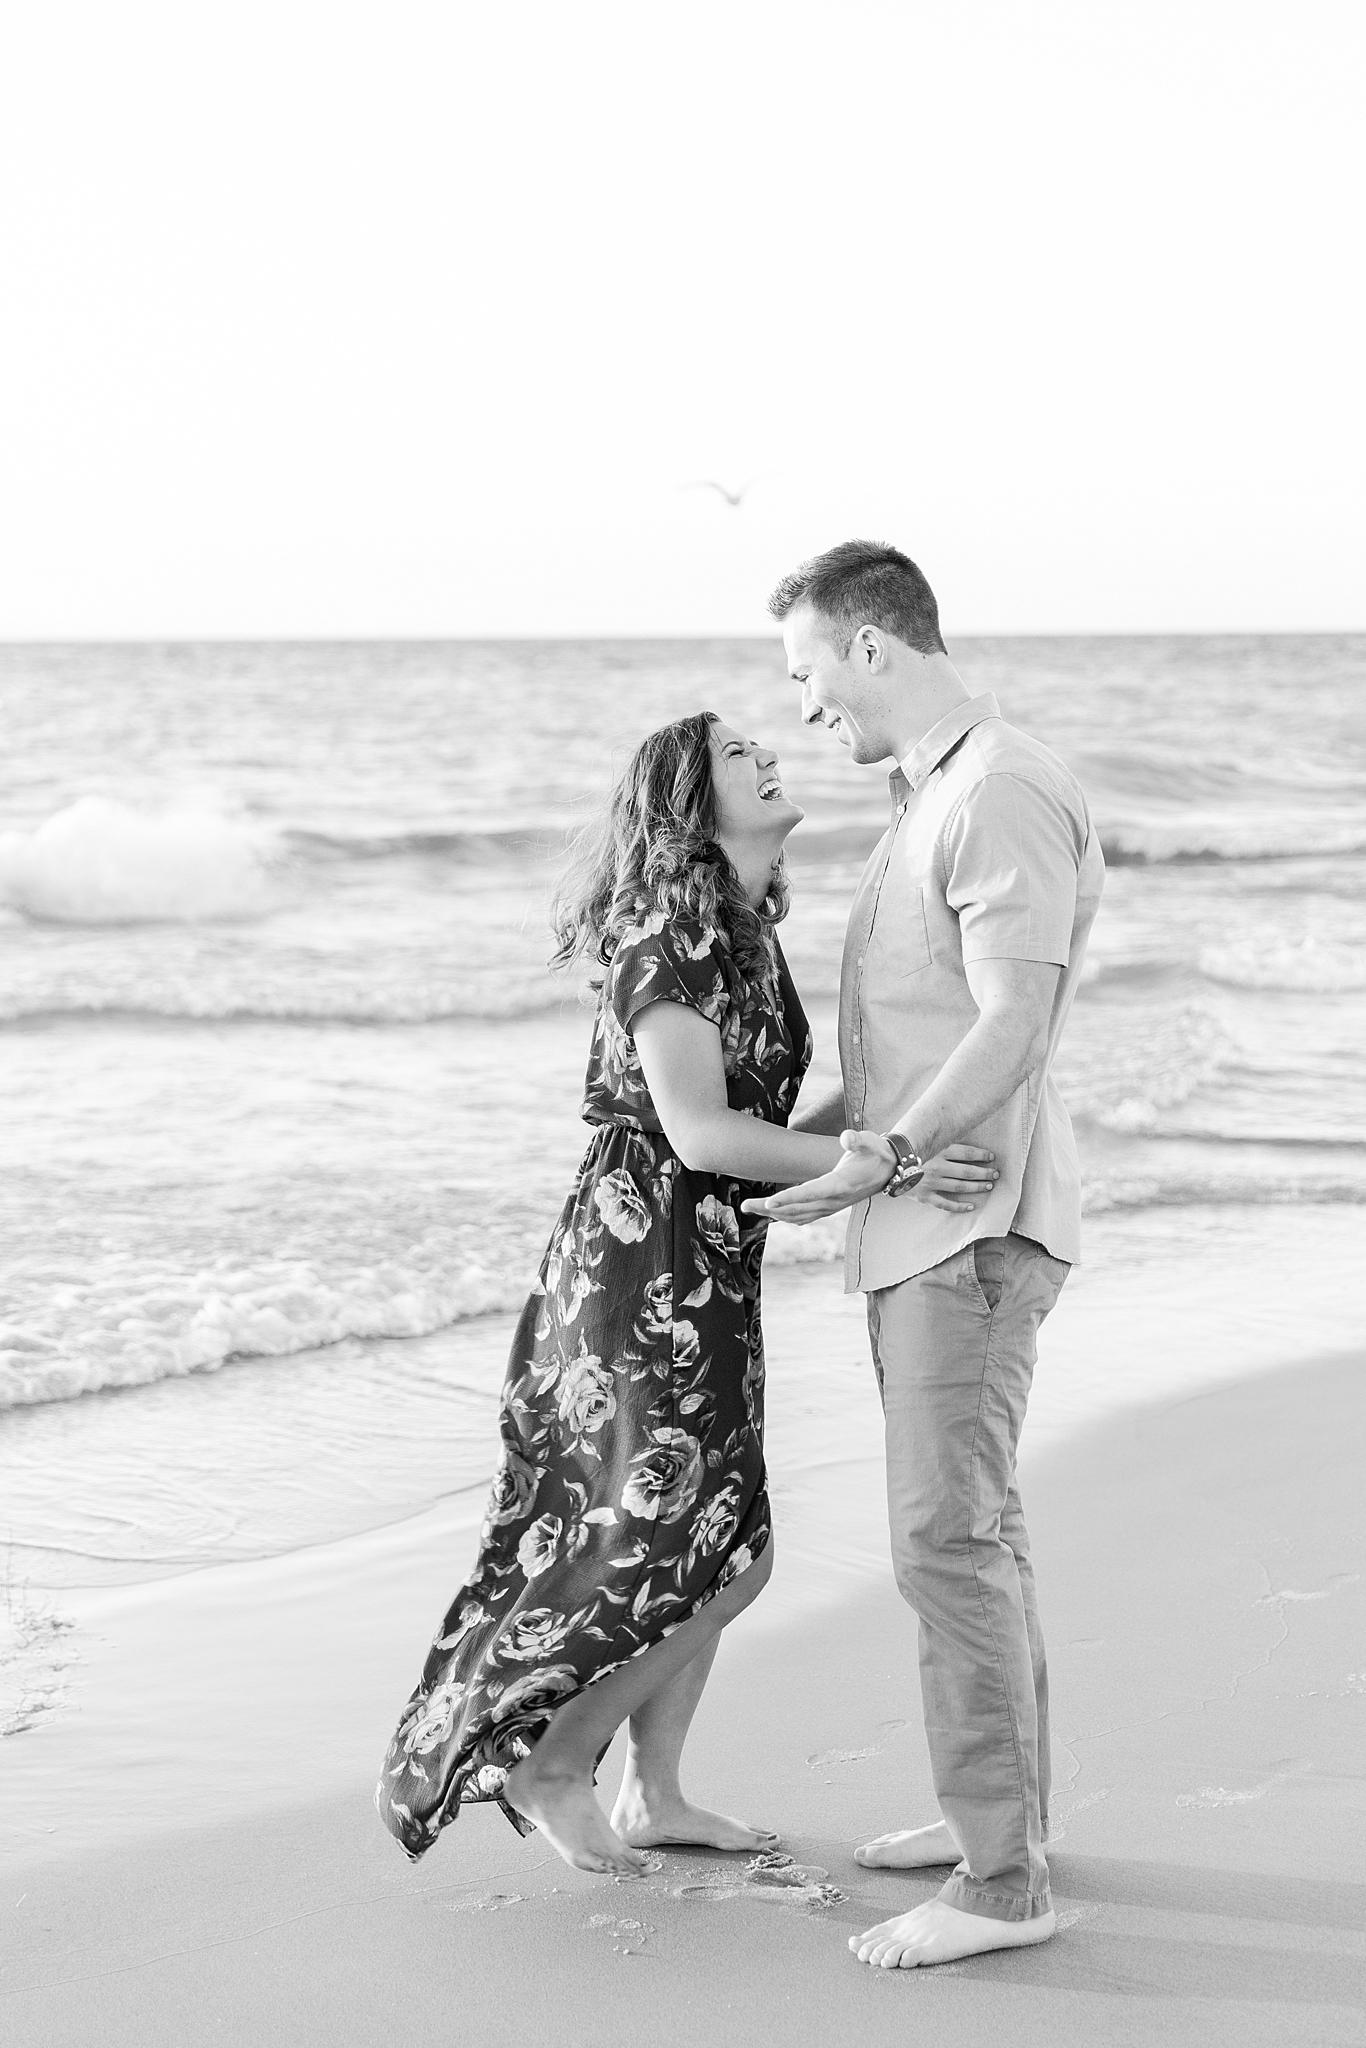 romantic--summer-beach-engagement-photography-in-st-joseph-mi-by-courtney-carolyn-photography_0001.jpg